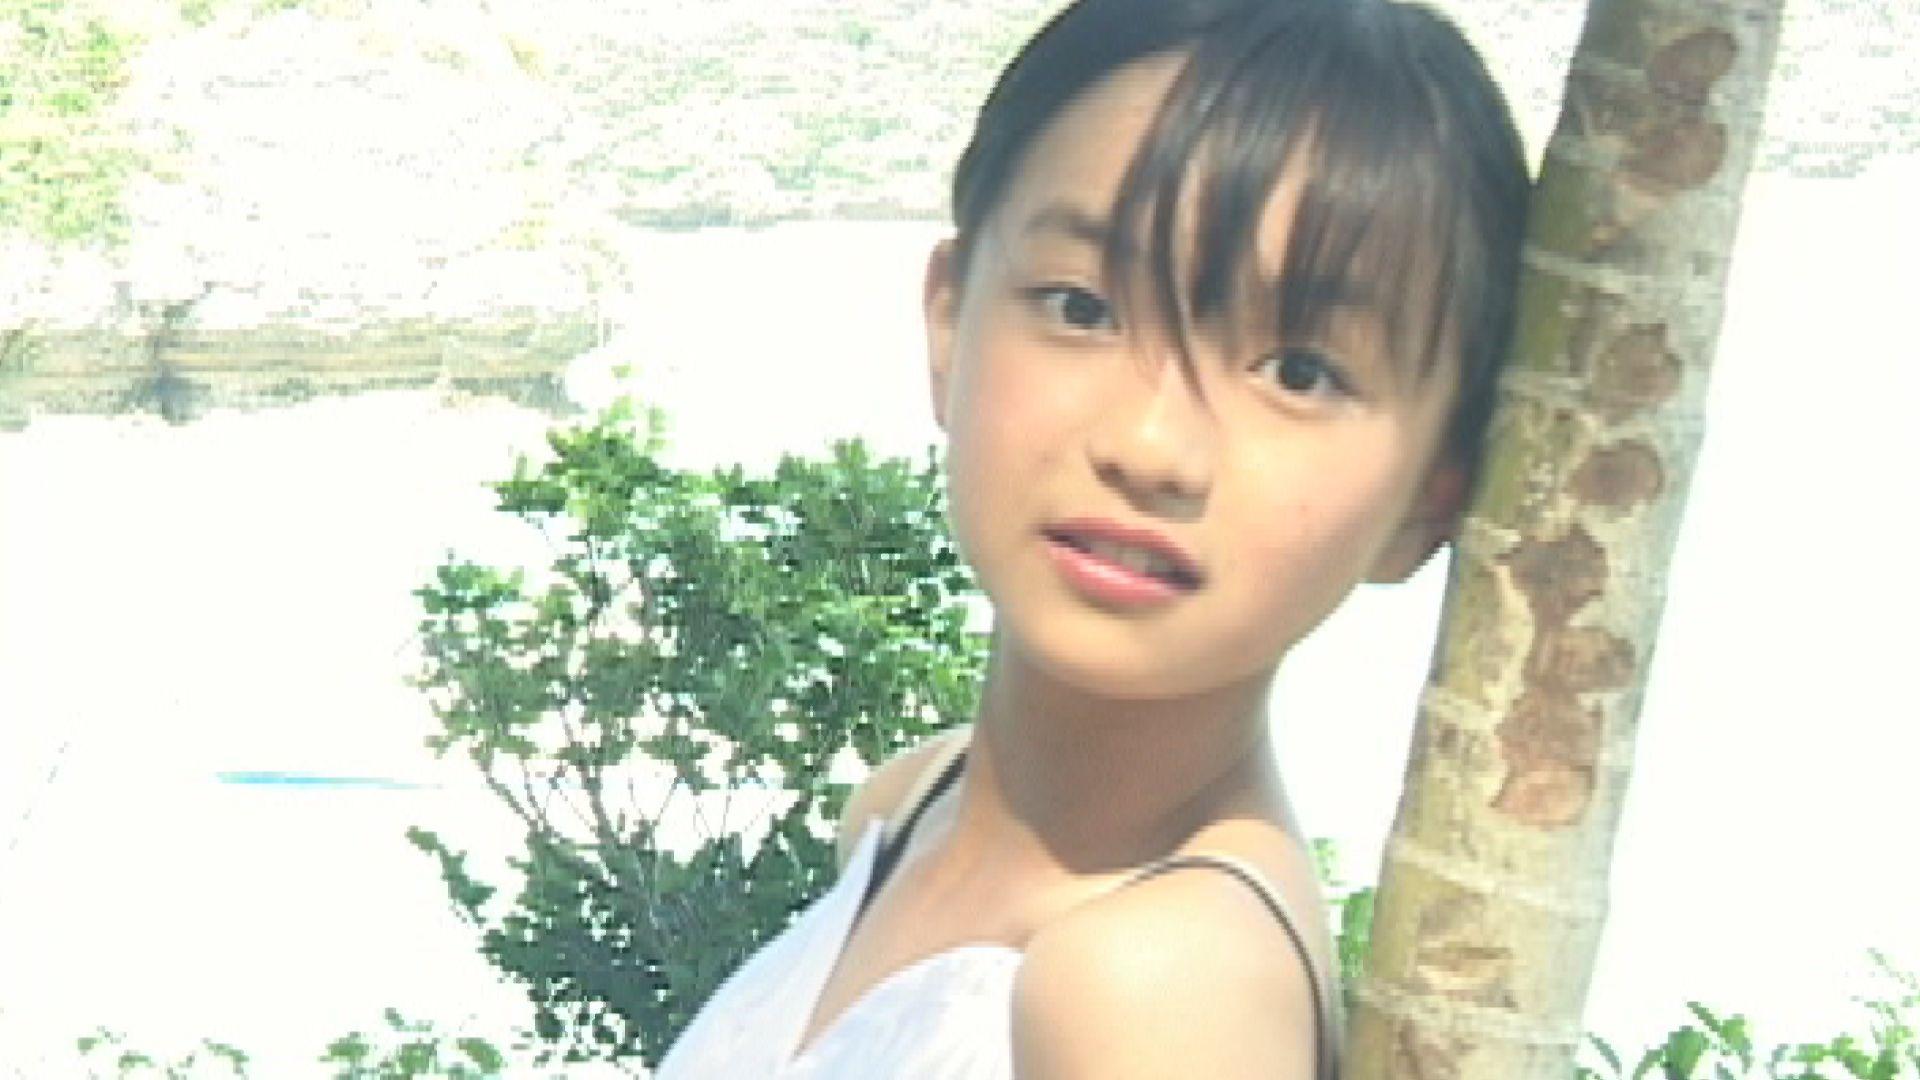 mayumi vol.1 / まゆみ 14